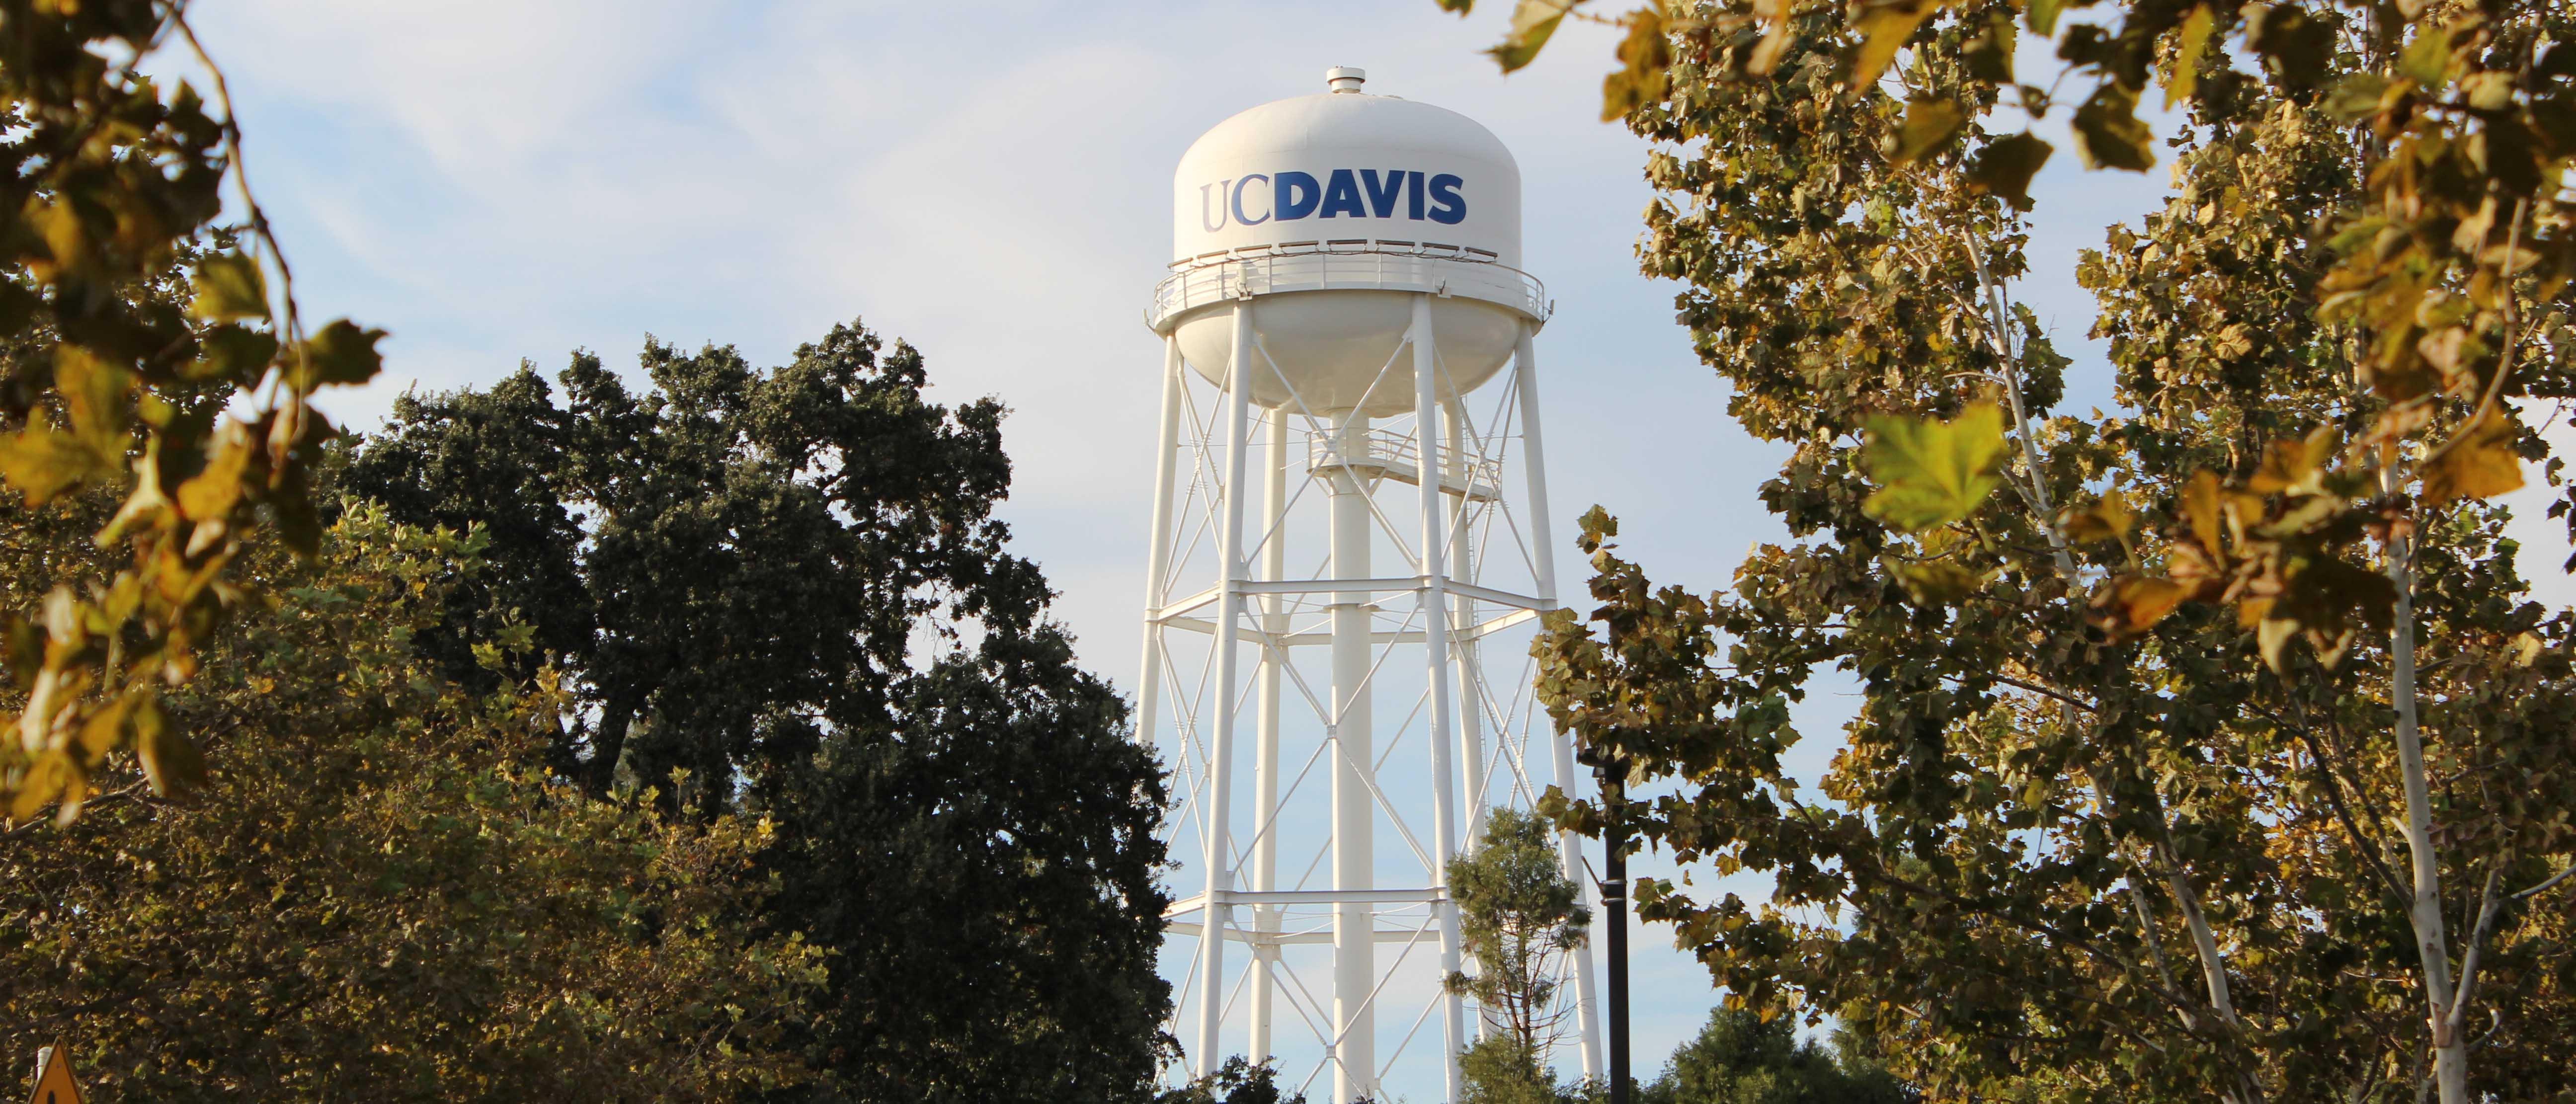 Davis Water Tower The uc Davis Water Tower on